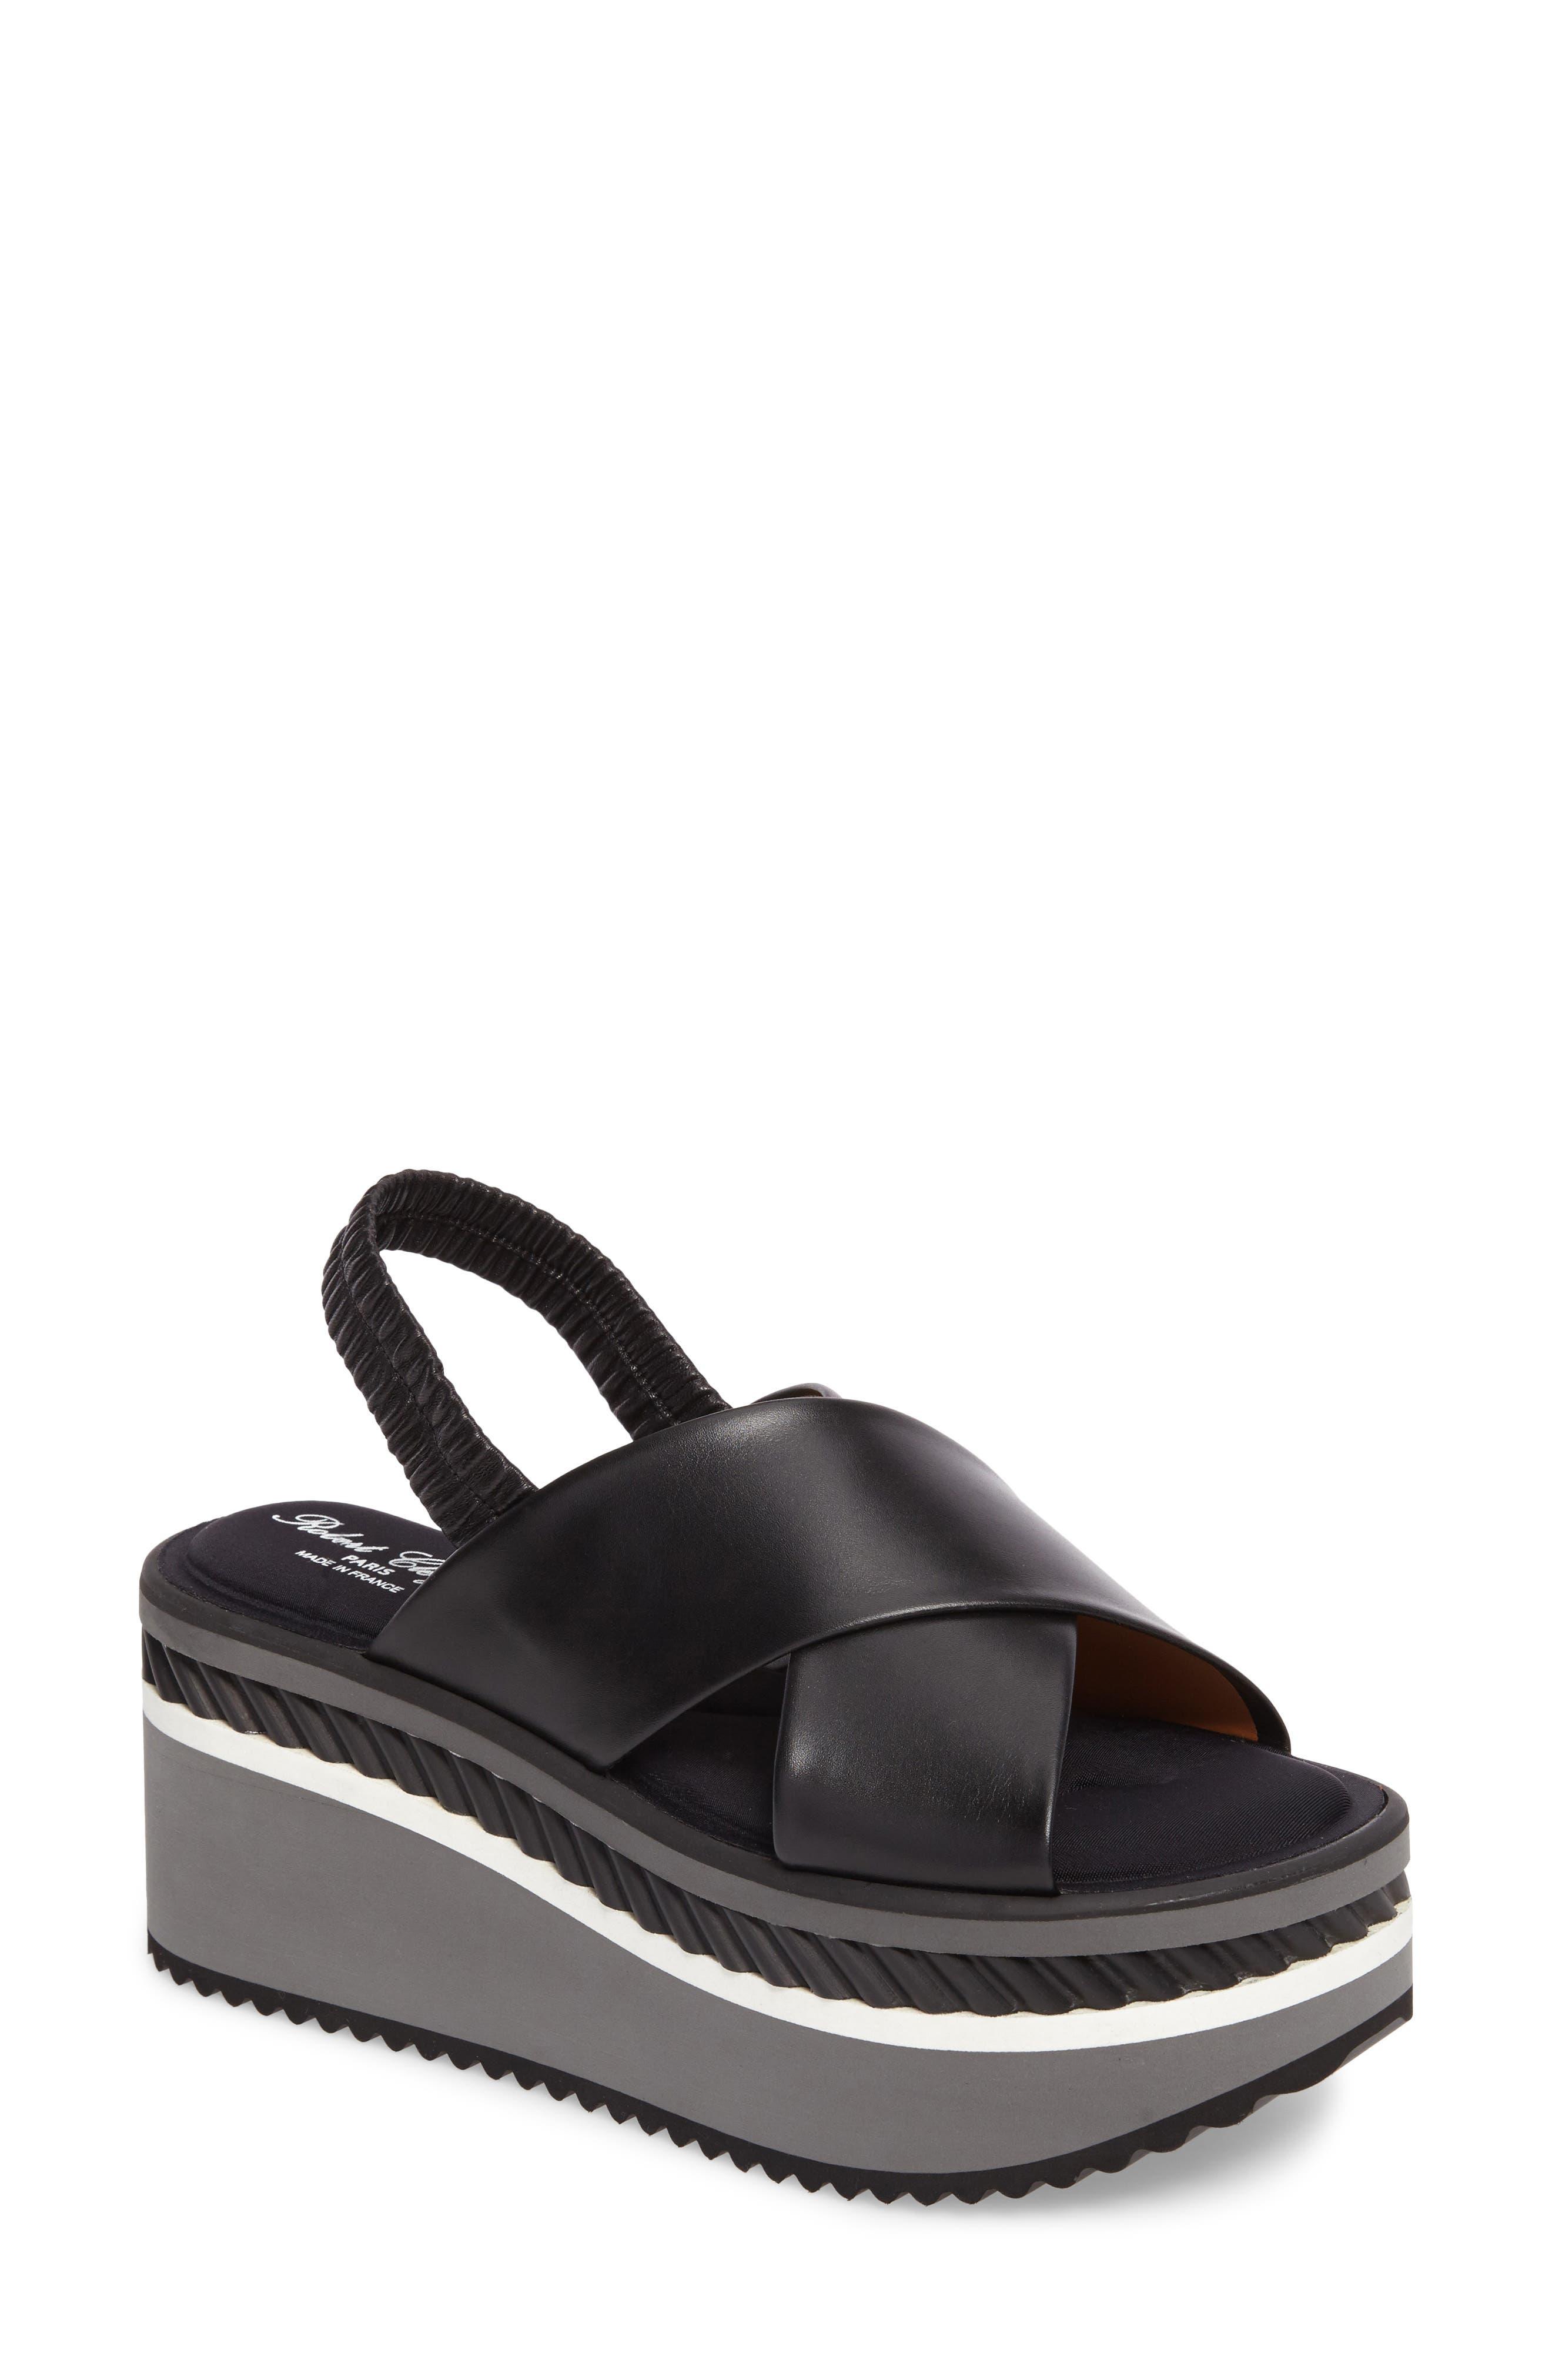 Omin Platform Slingback Sandal,                             Main thumbnail 1, color,                             001